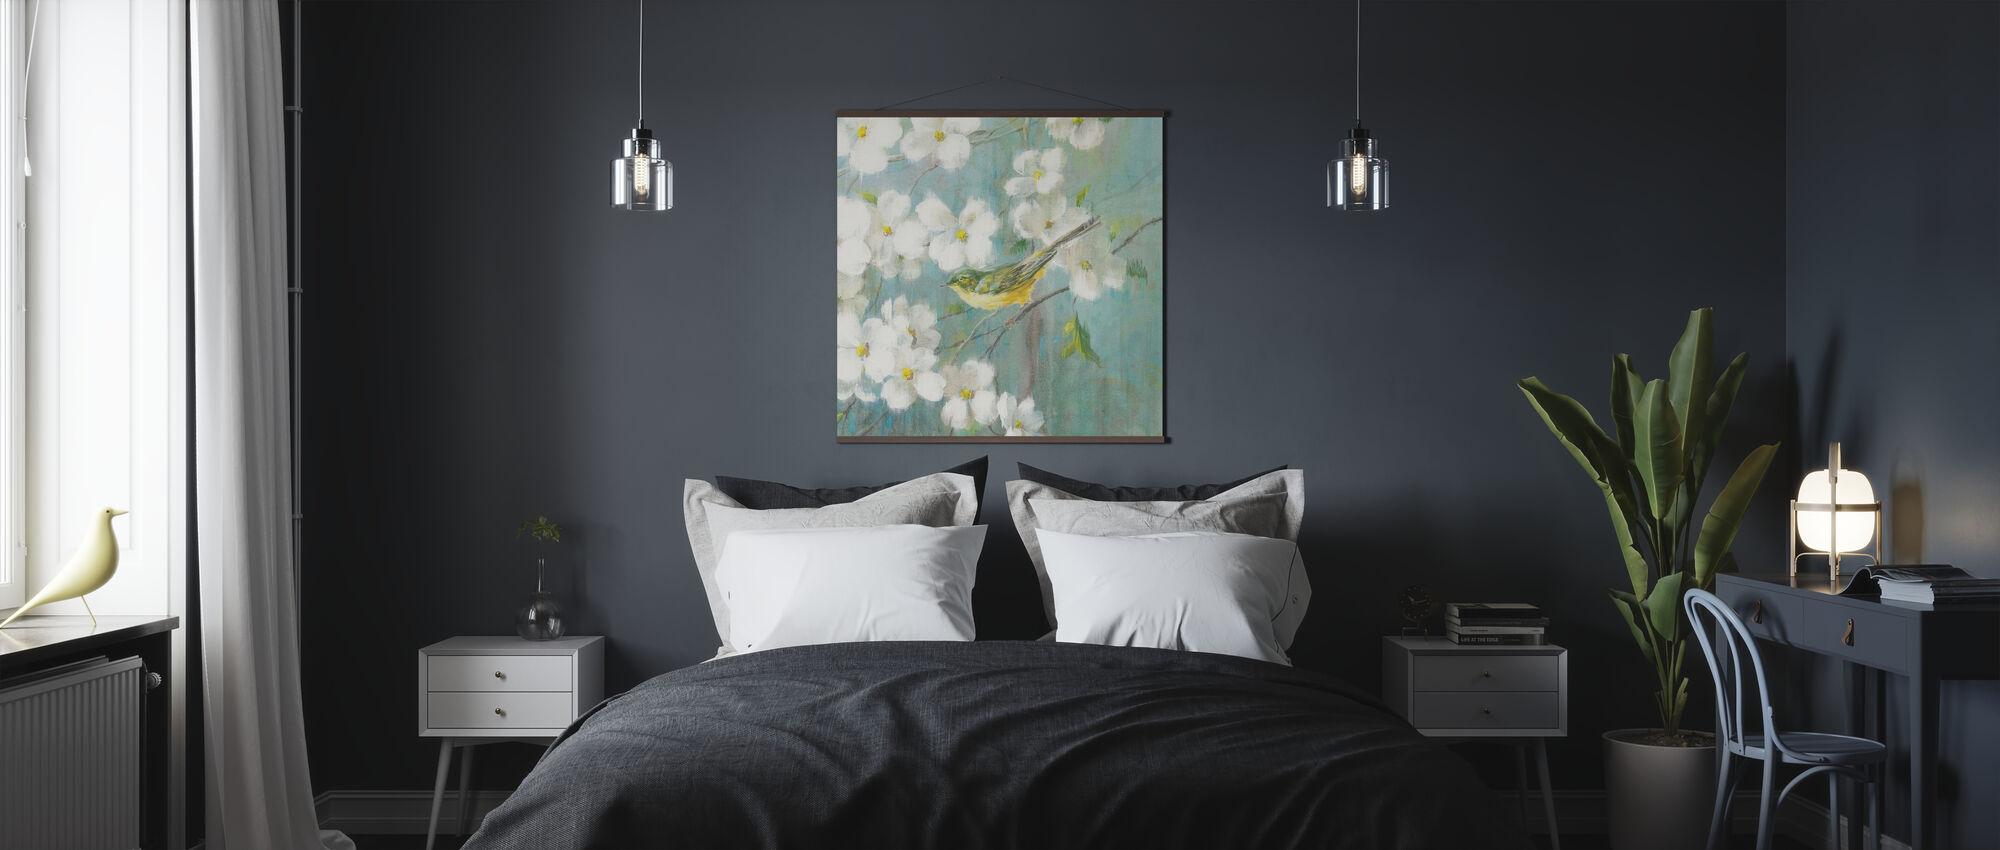 Lente droom 4 - Poster - Slaapkamer